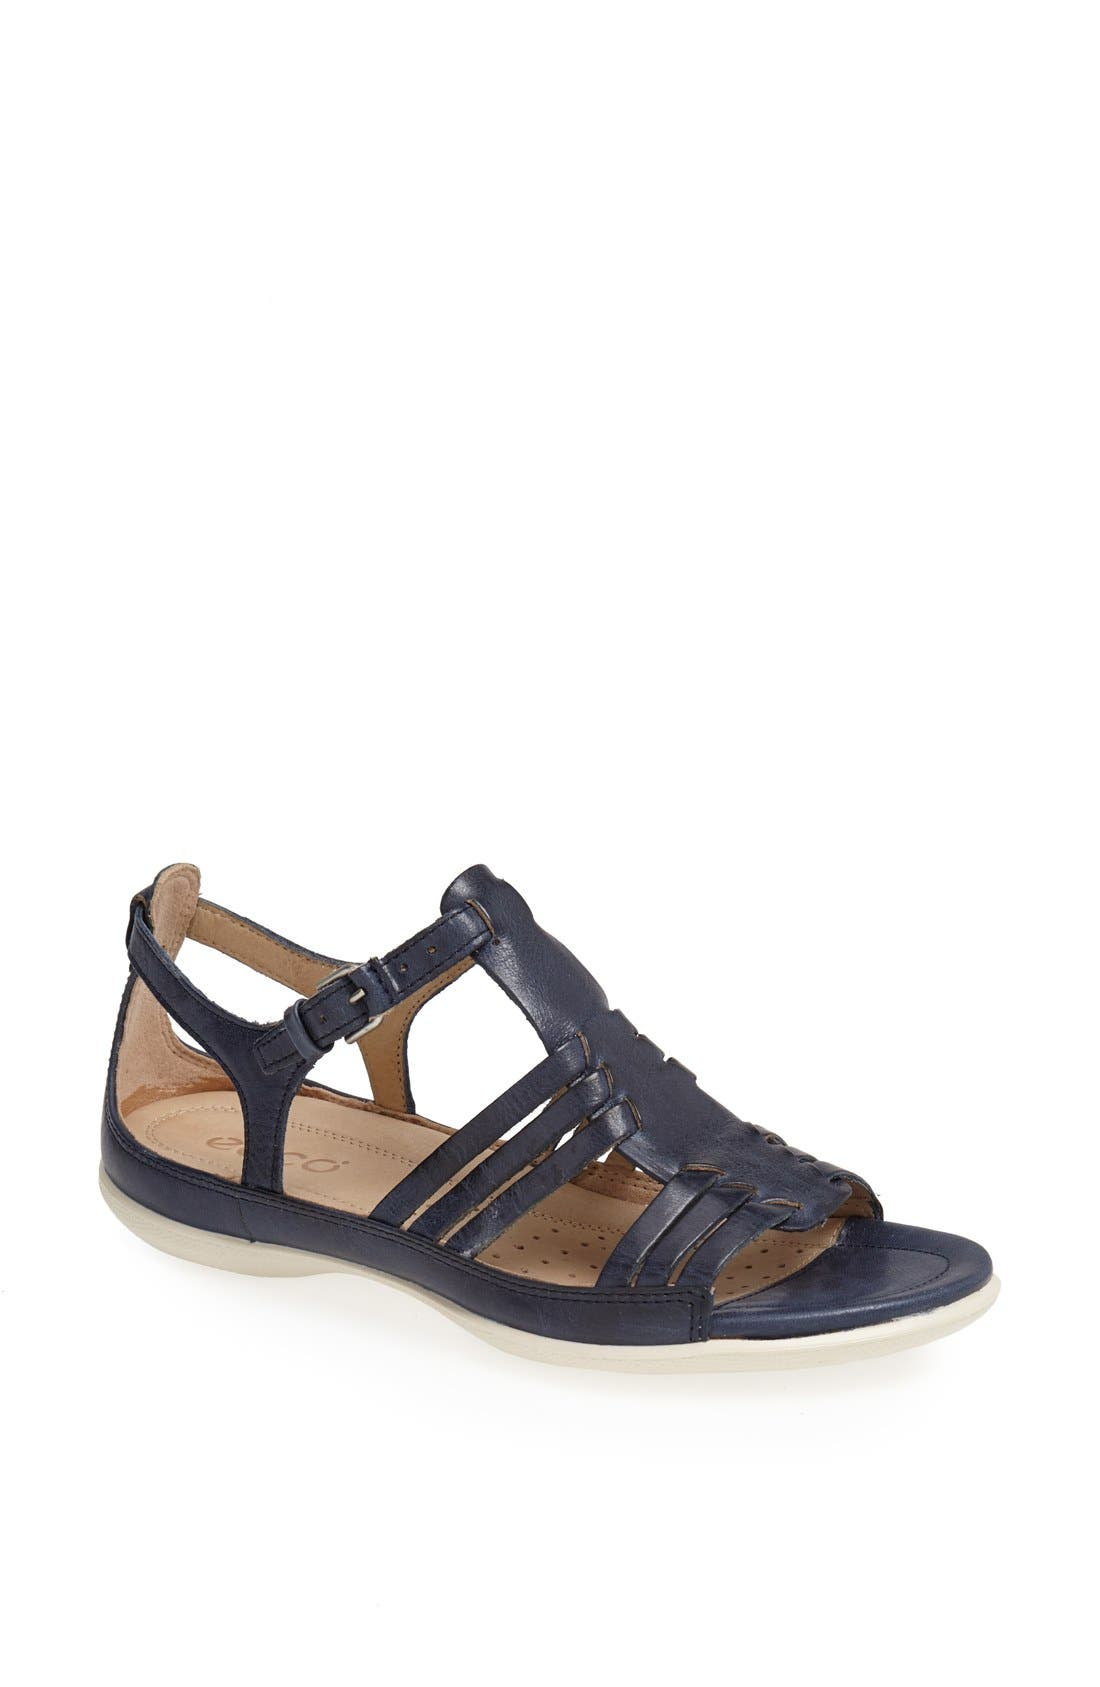 Main Image - ECCO 'Flash' Sandal